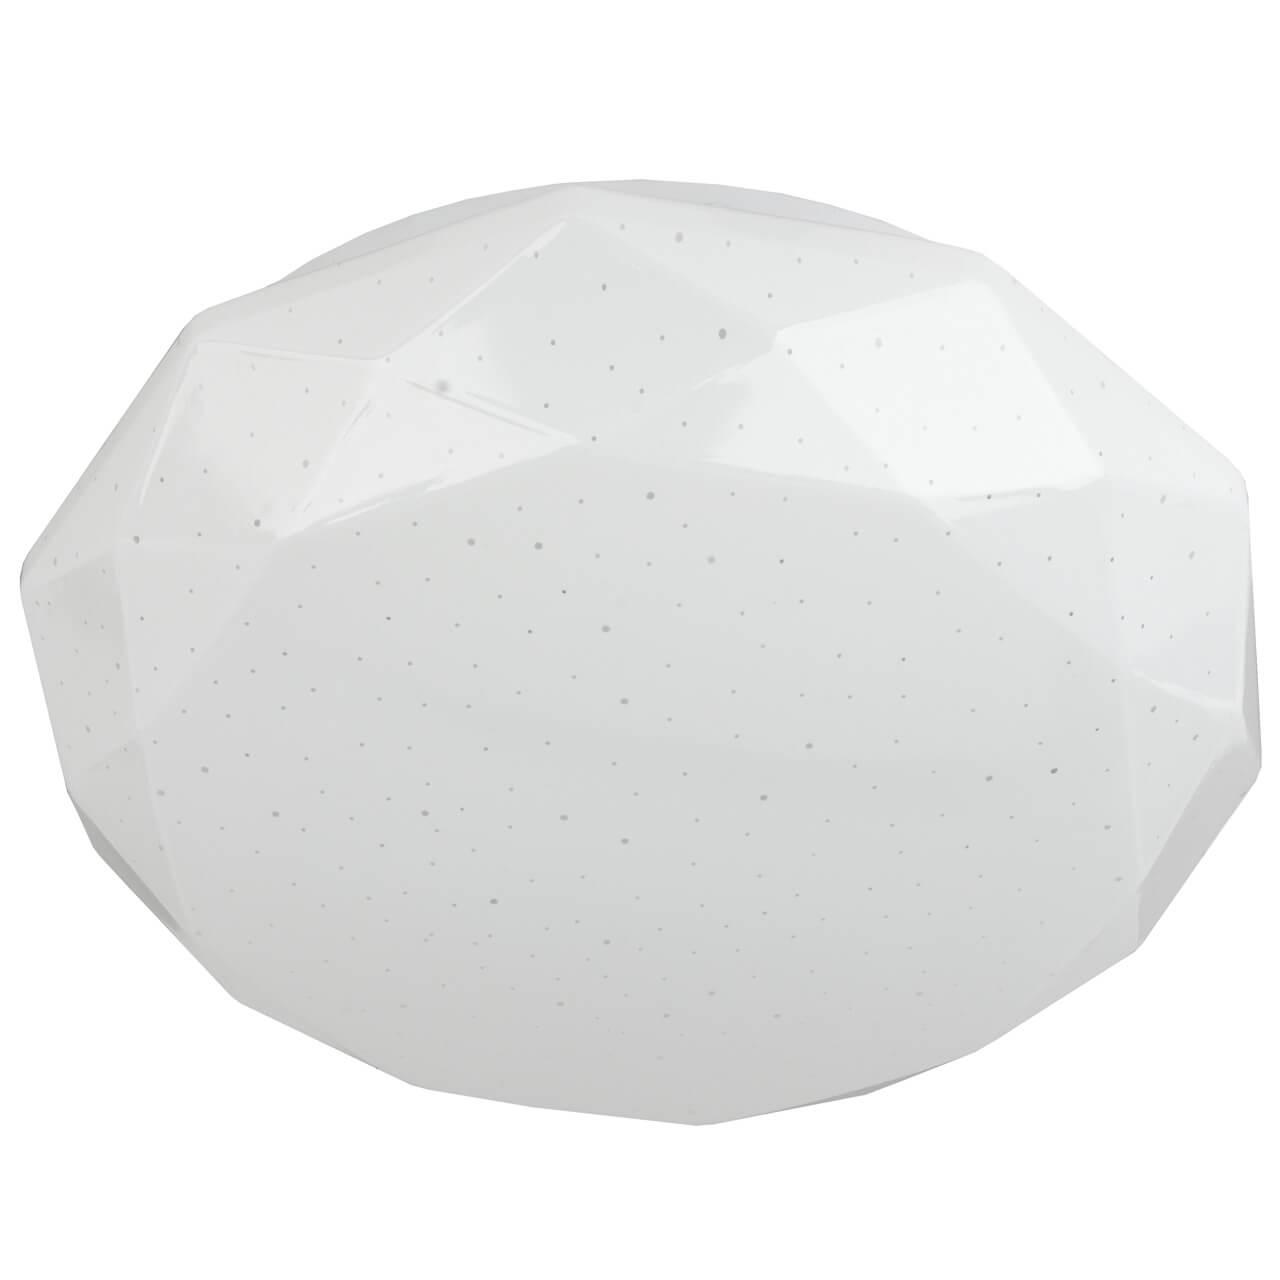 Светильник ЭРА SPB-6-14-6,5K Sparkle